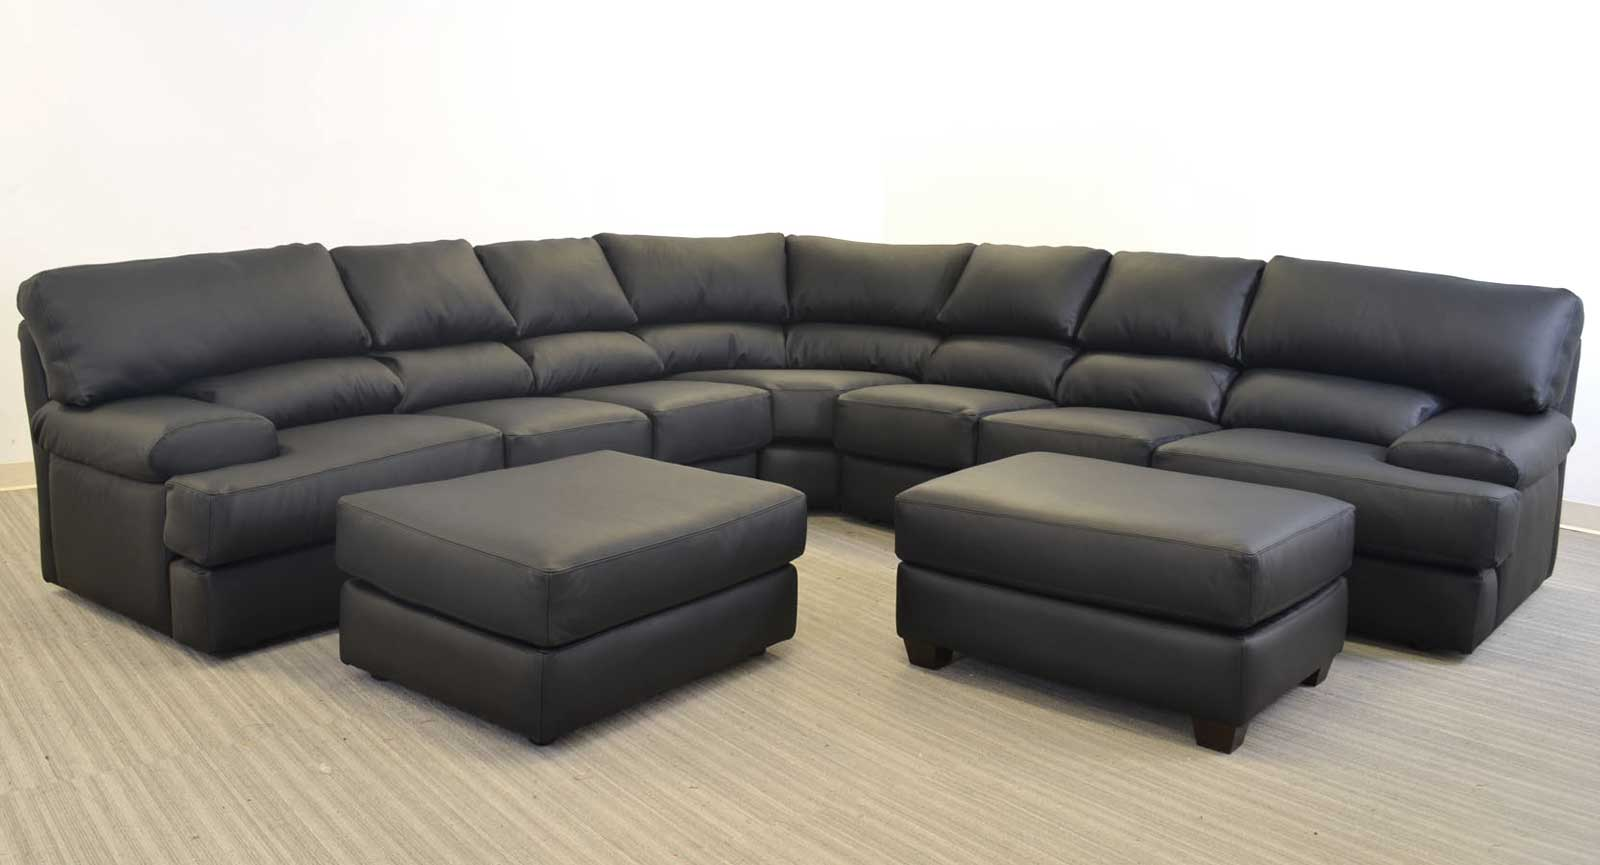 Incredible Jaguar The Leather Sofa Company Spiritservingveterans Wood Chair Design Ideas Spiritservingveteransorg